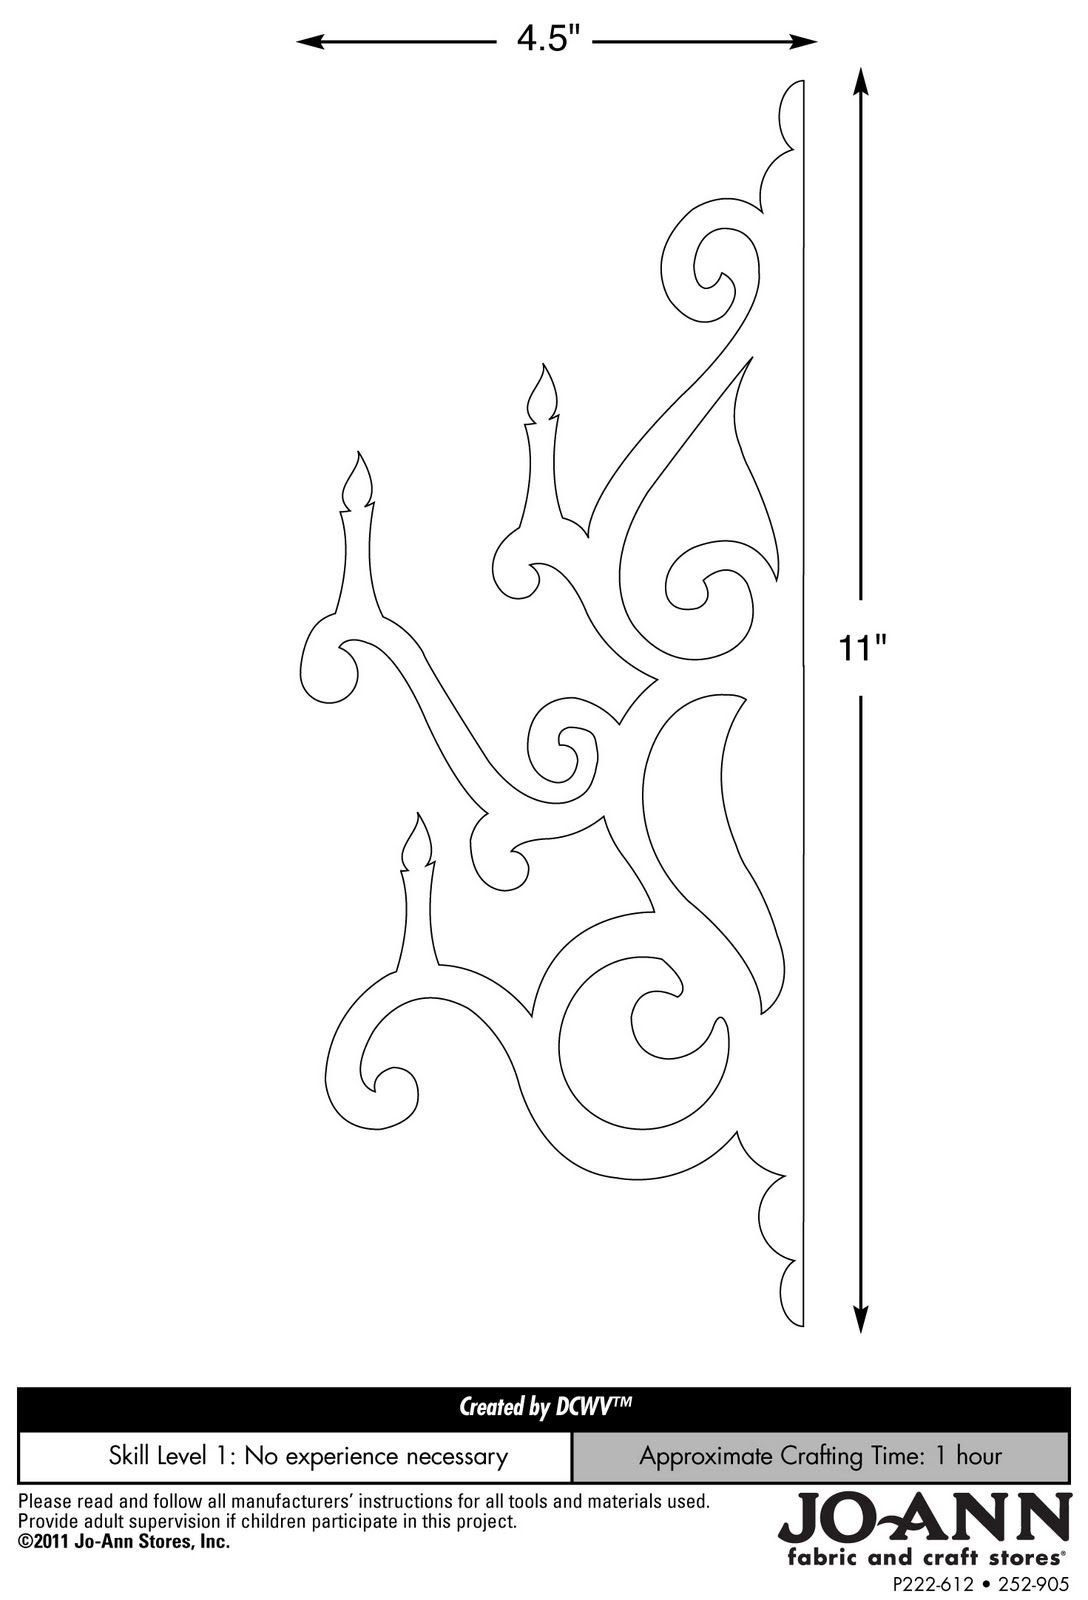 Paper Chandelier Template | Paper Party Chandelier From Jo-Ann | Jo - Free Printable Chandelier Template